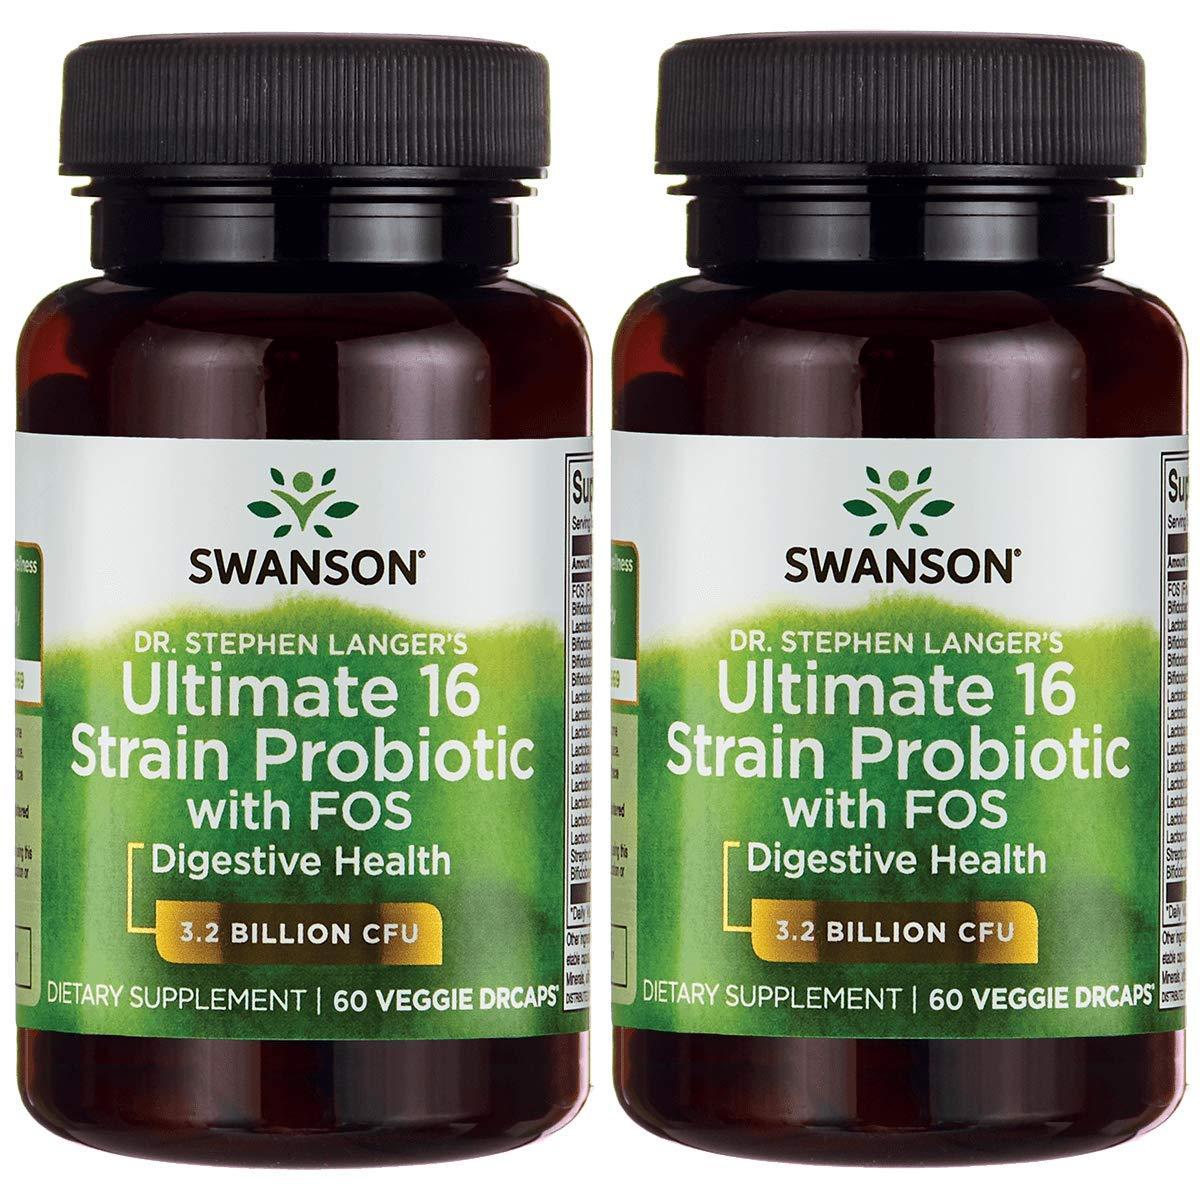 Swanson Probiotic Prebiotic Digestive Supplement